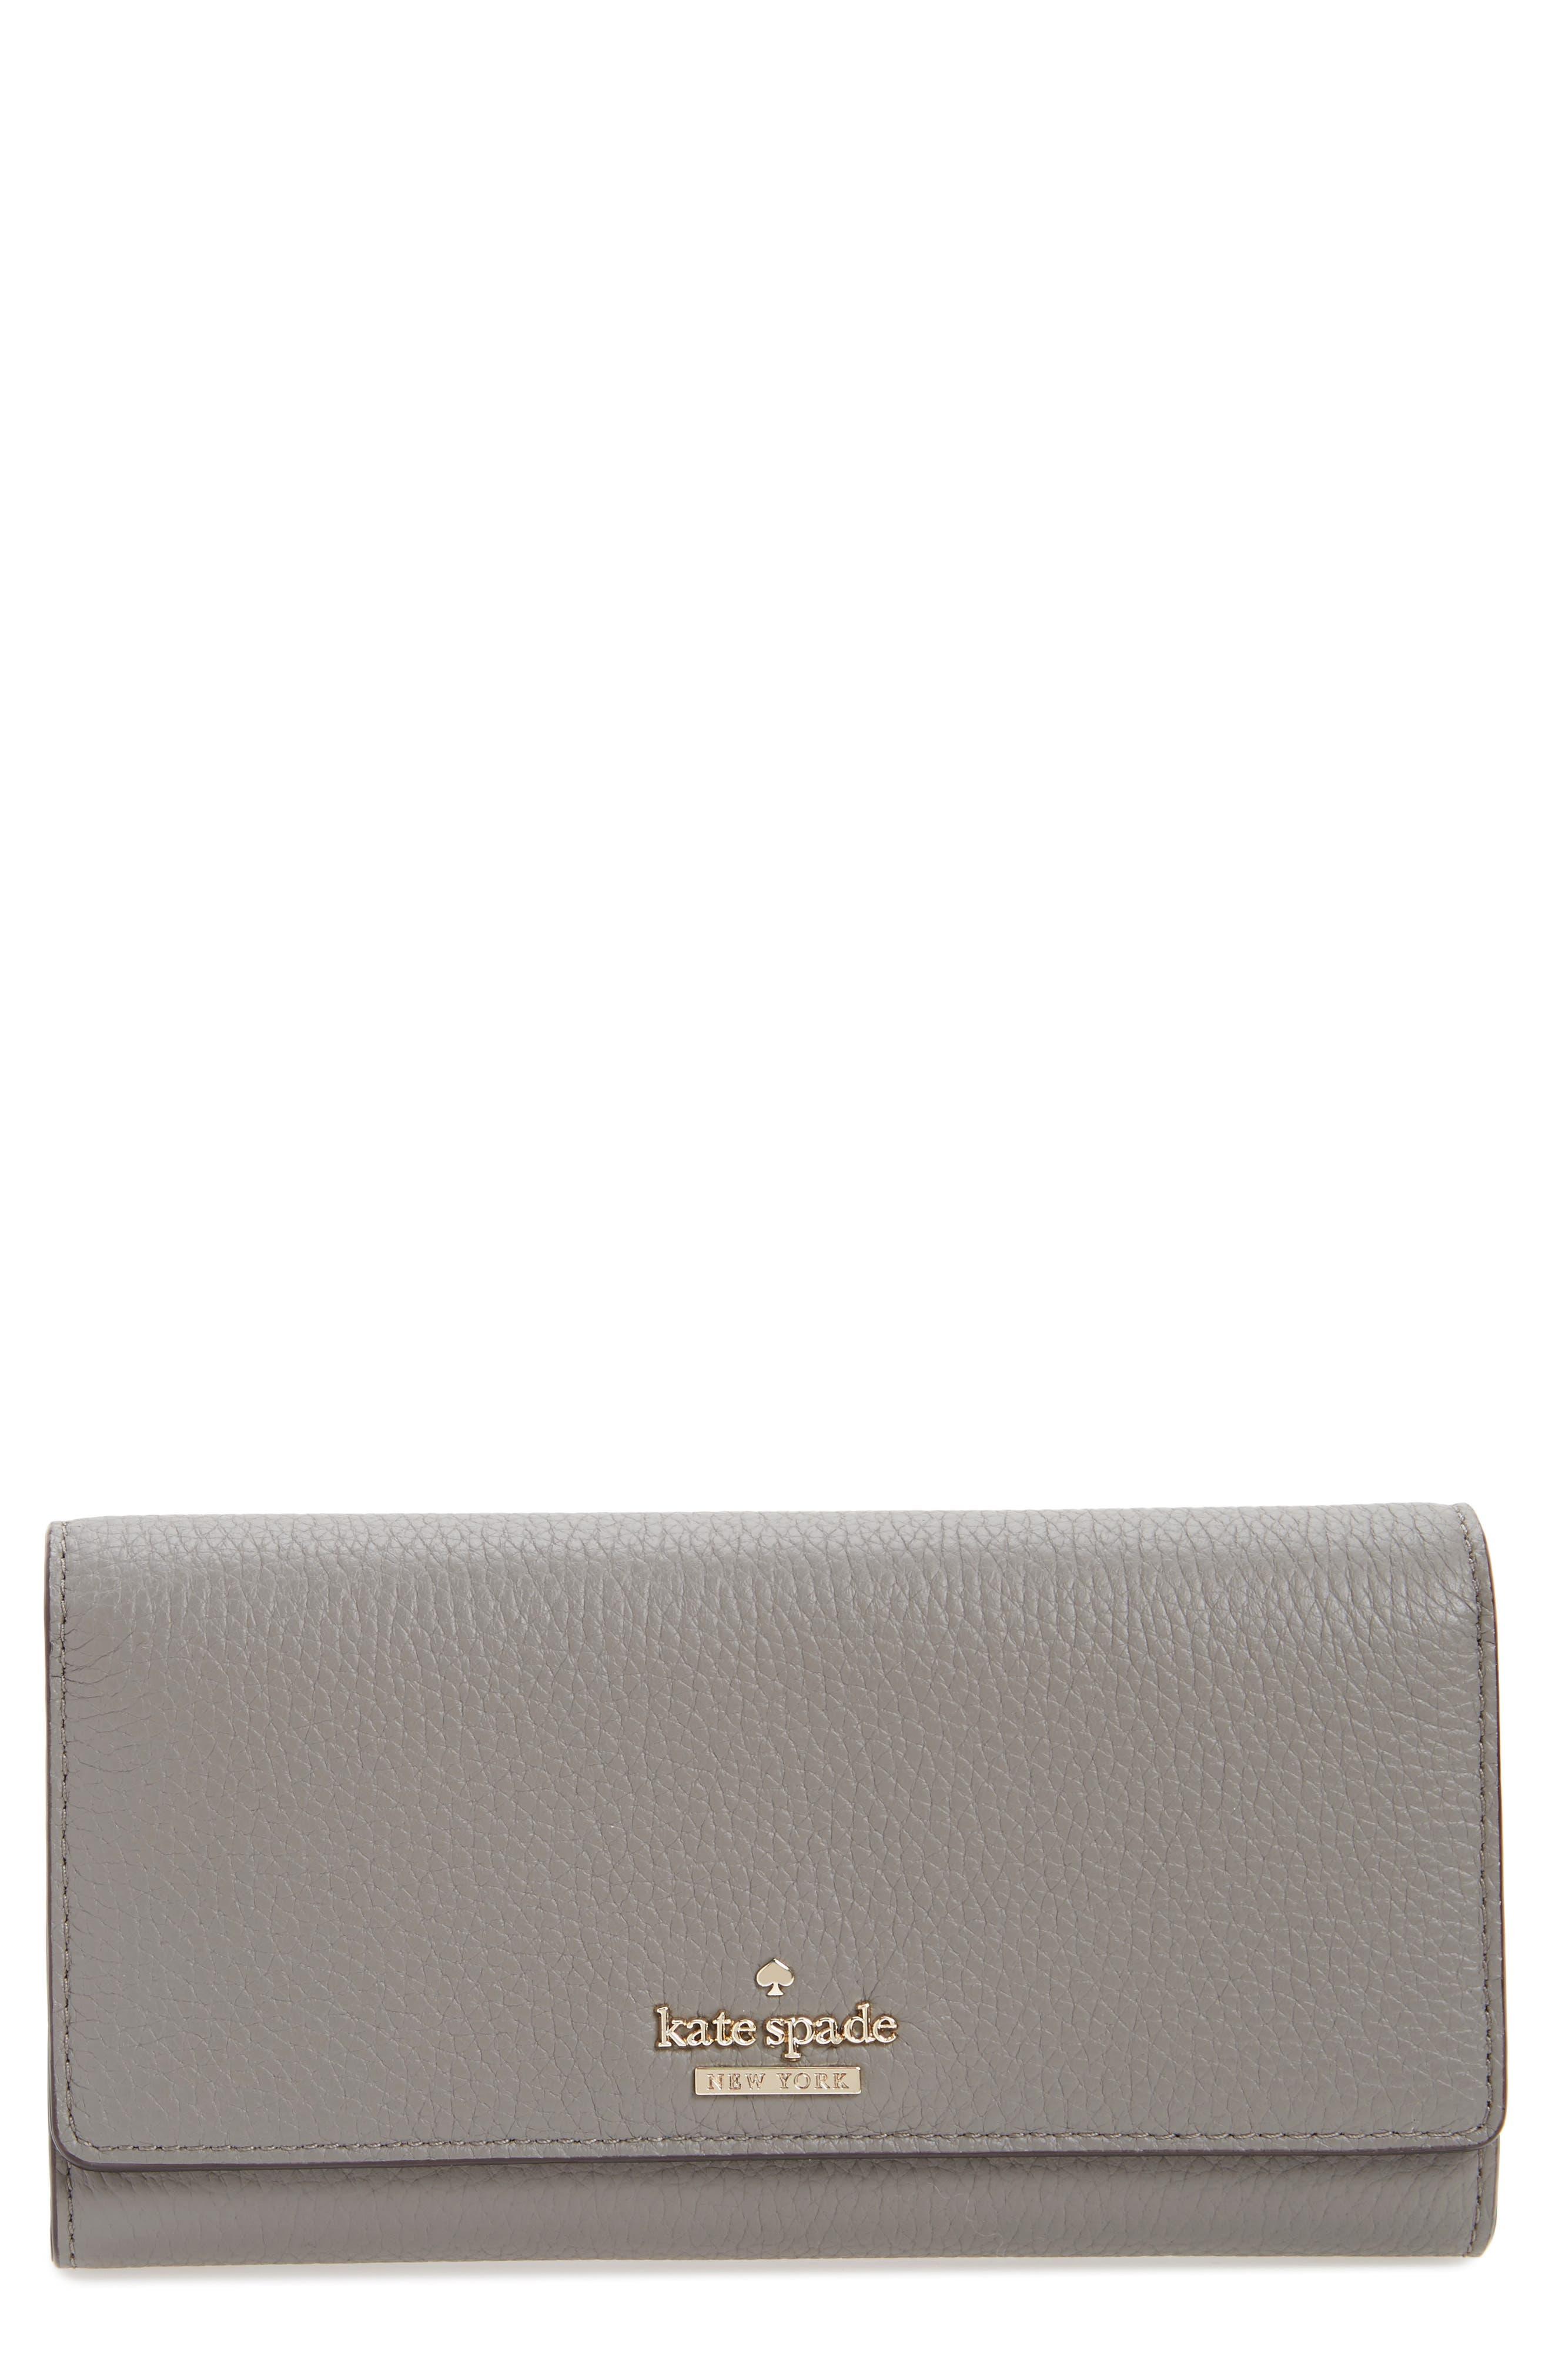 kate spade new york jackson street - celina leather wallet